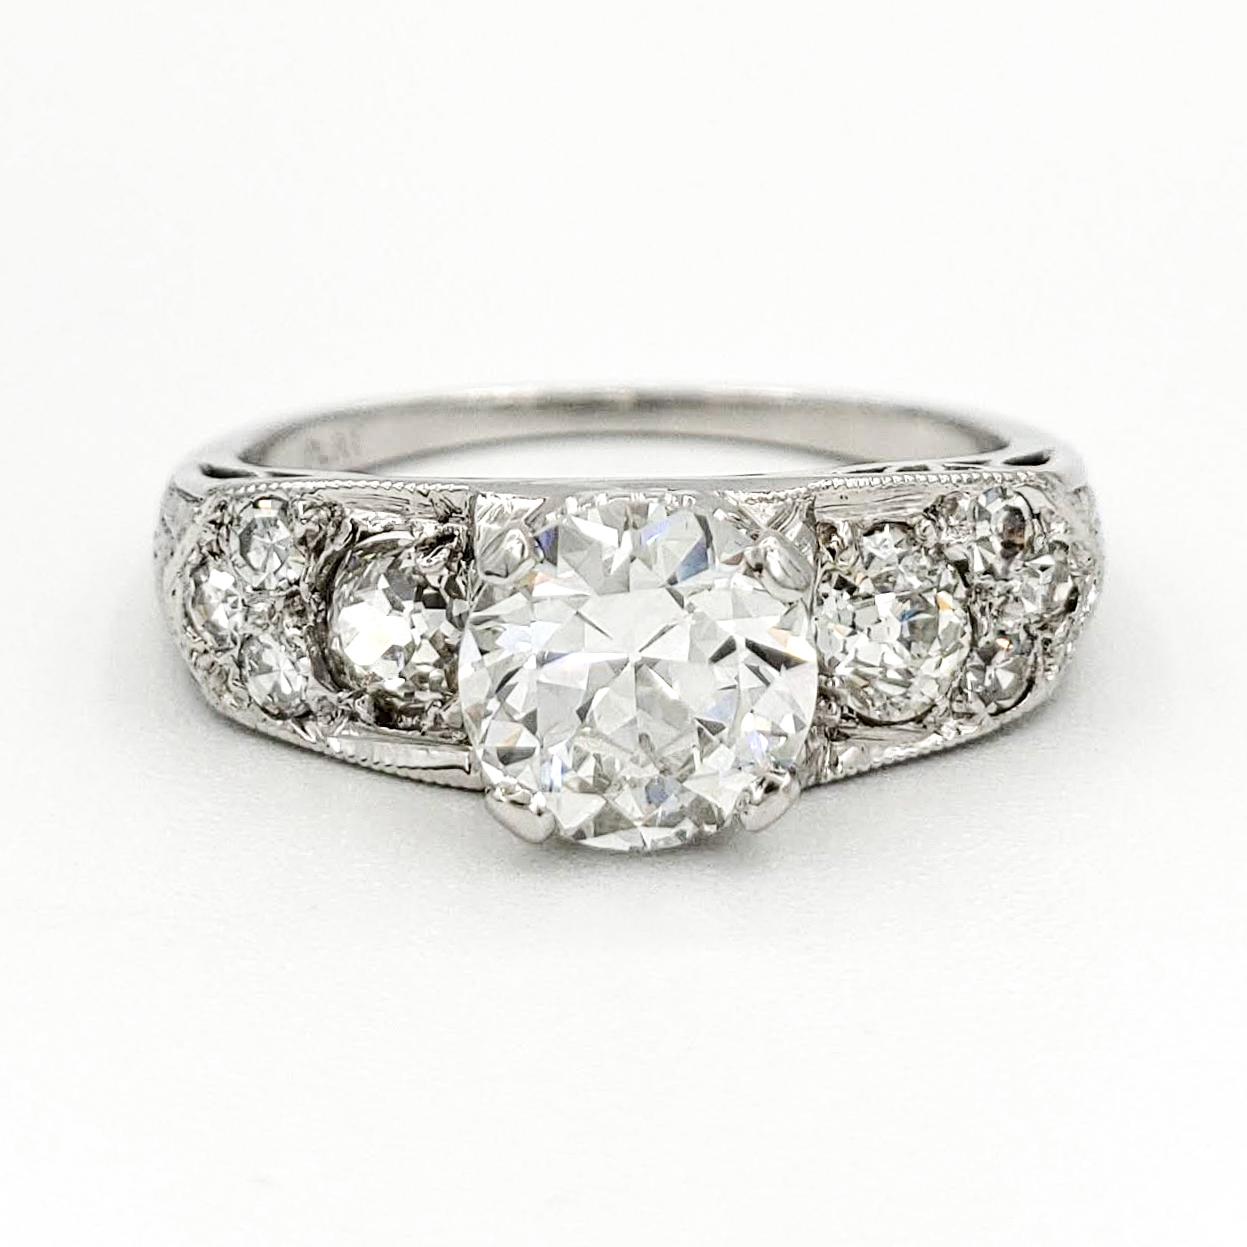 vintage-platinum-engagement-ring-with-0-79-carat-old-european-cut-diamond-egl-f-vs1